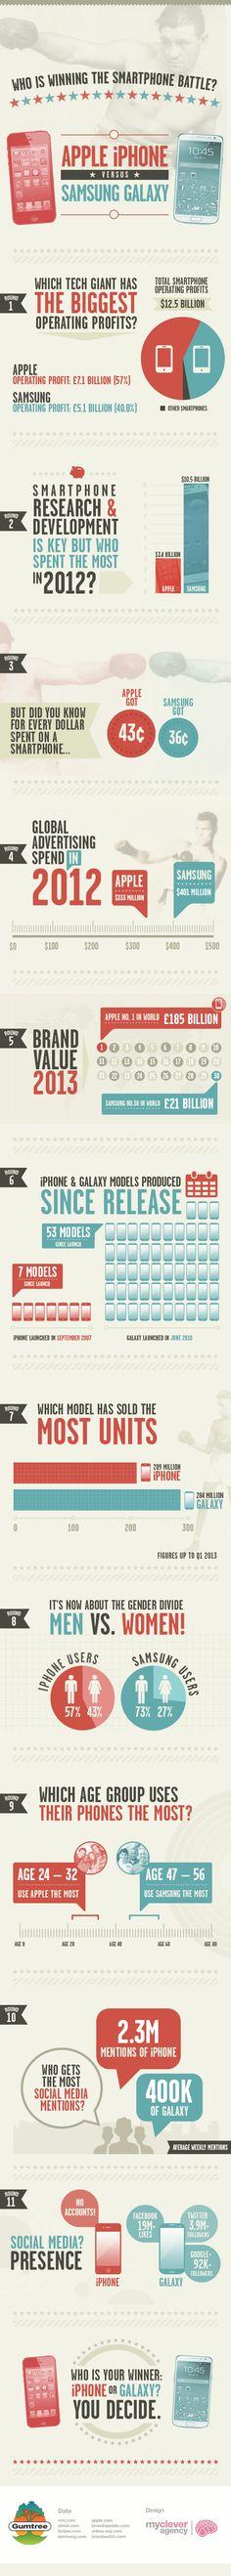 Apple iPhone vs. Samsung Galaxy: Who's winning the smartphone battle?